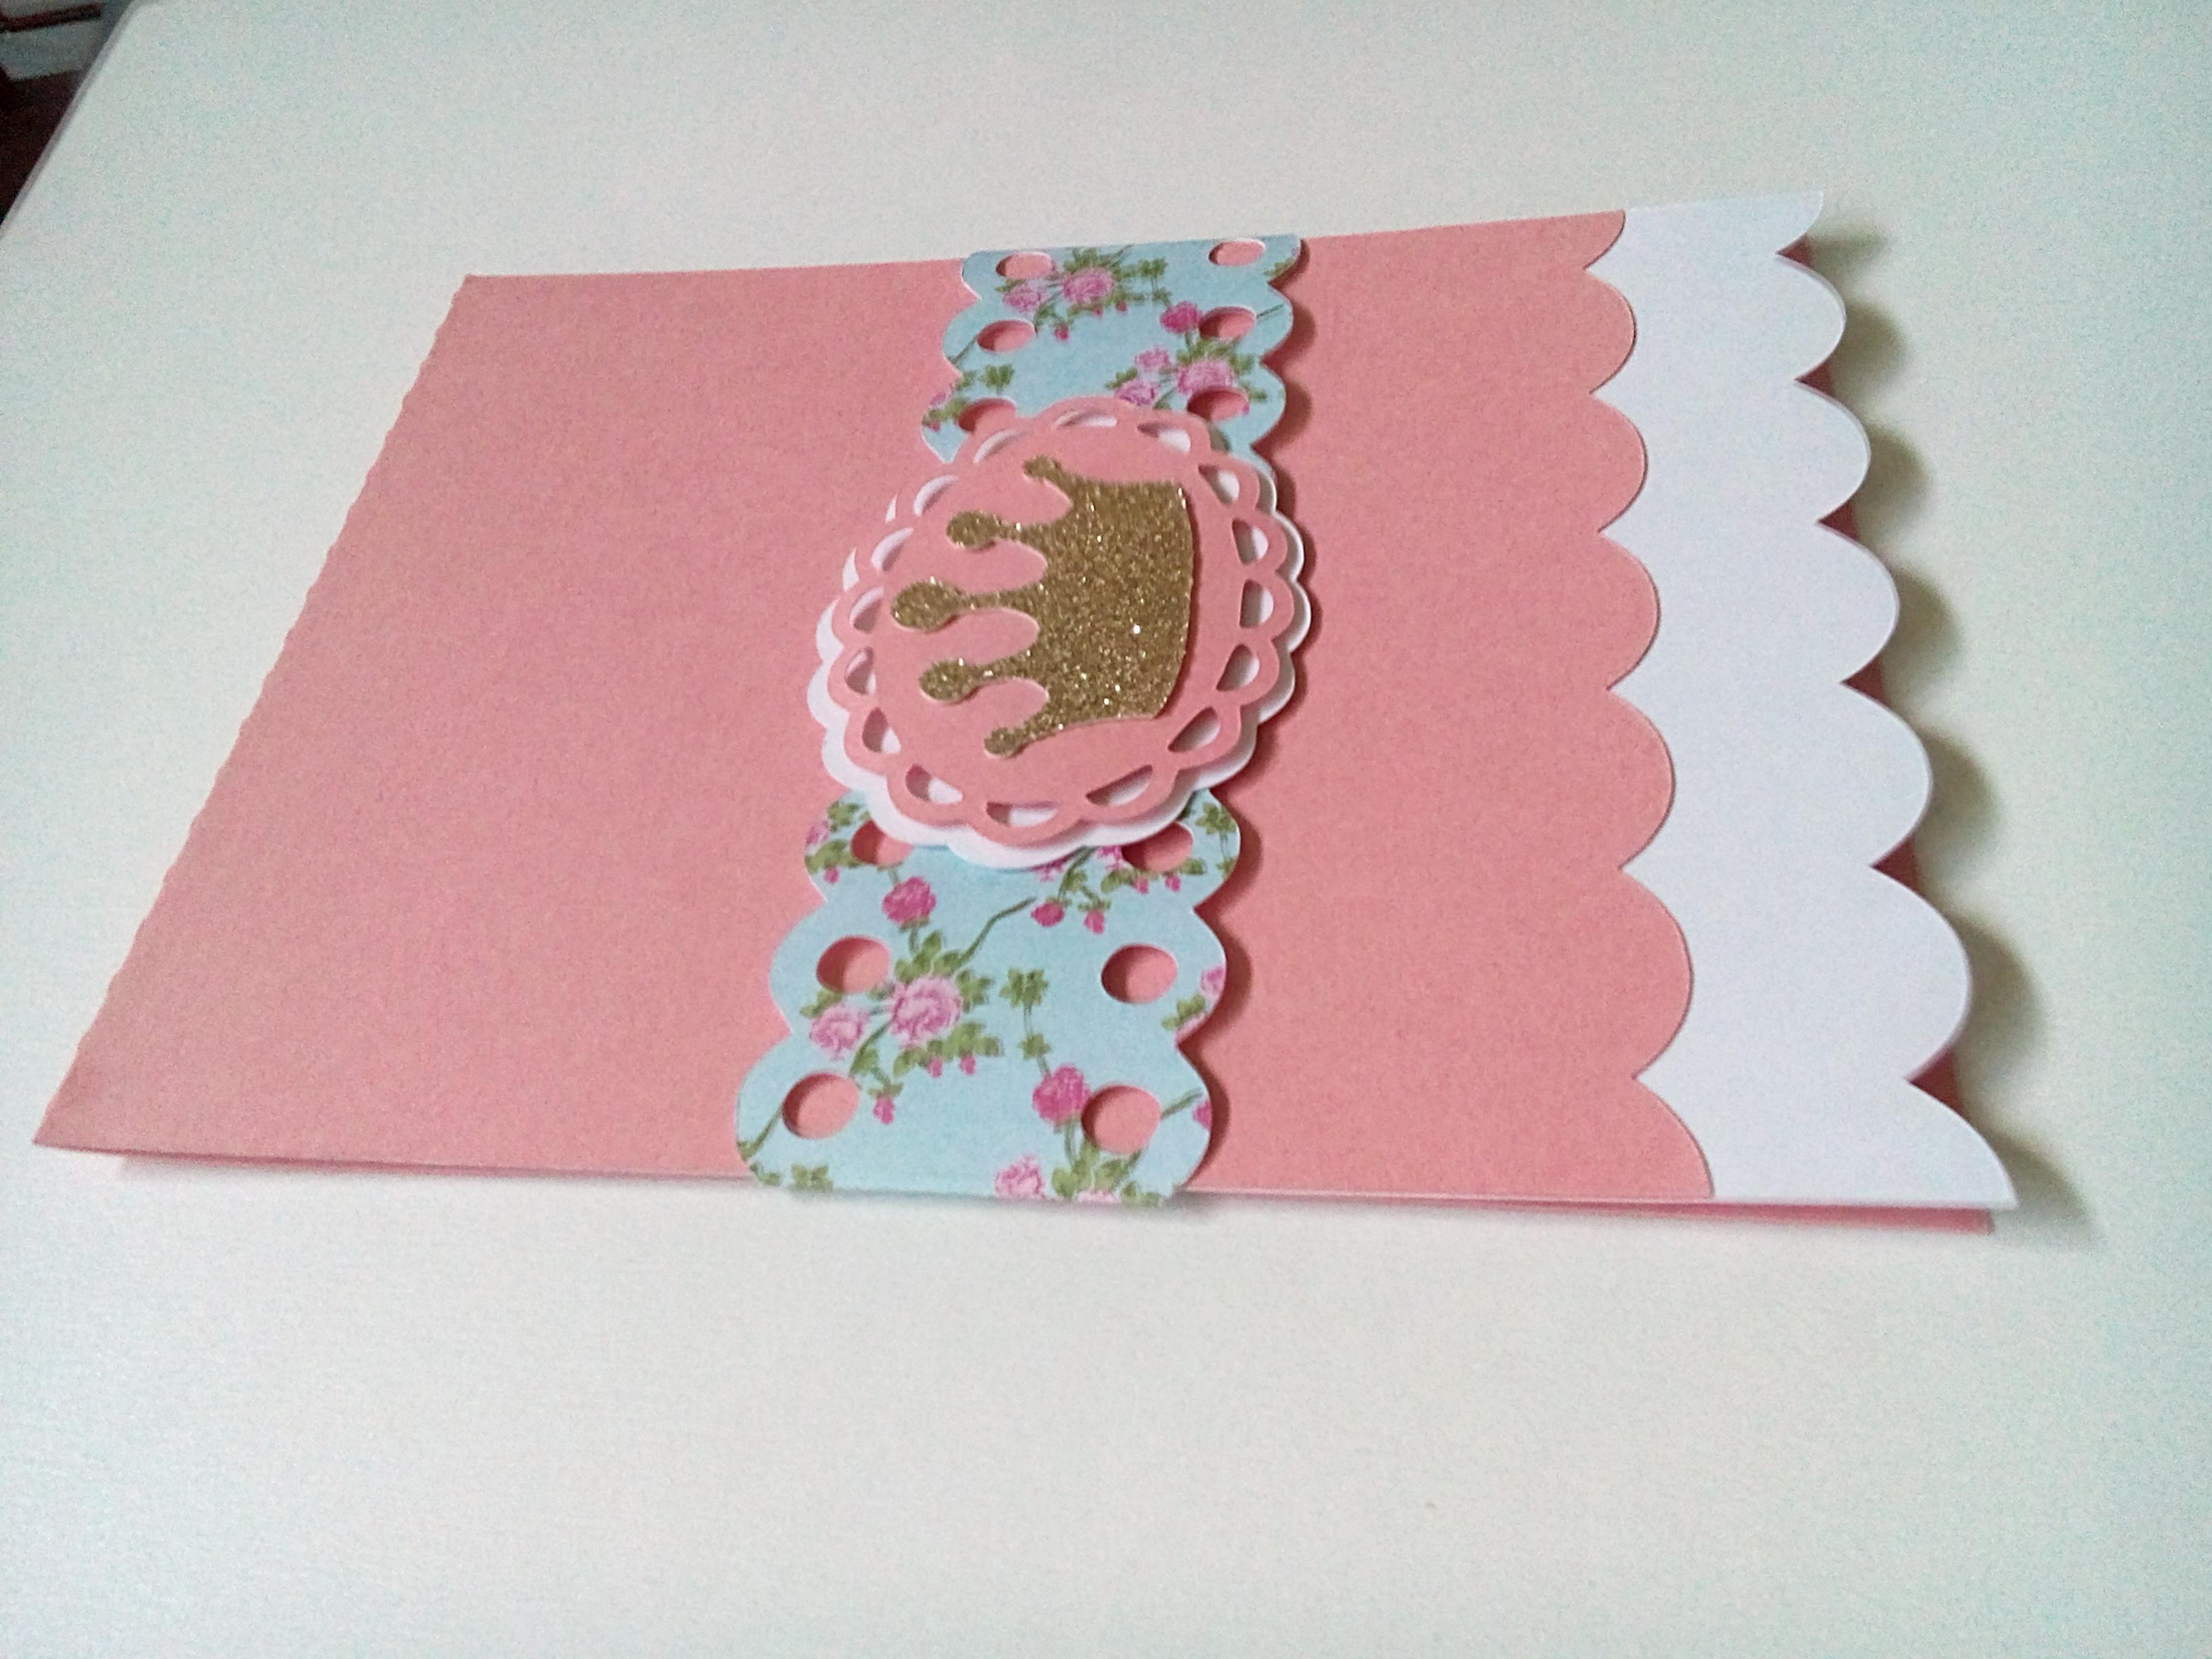 imagens de jardim encantado para convites: jardim encantado papel convite jardim encantado convite convite jardim